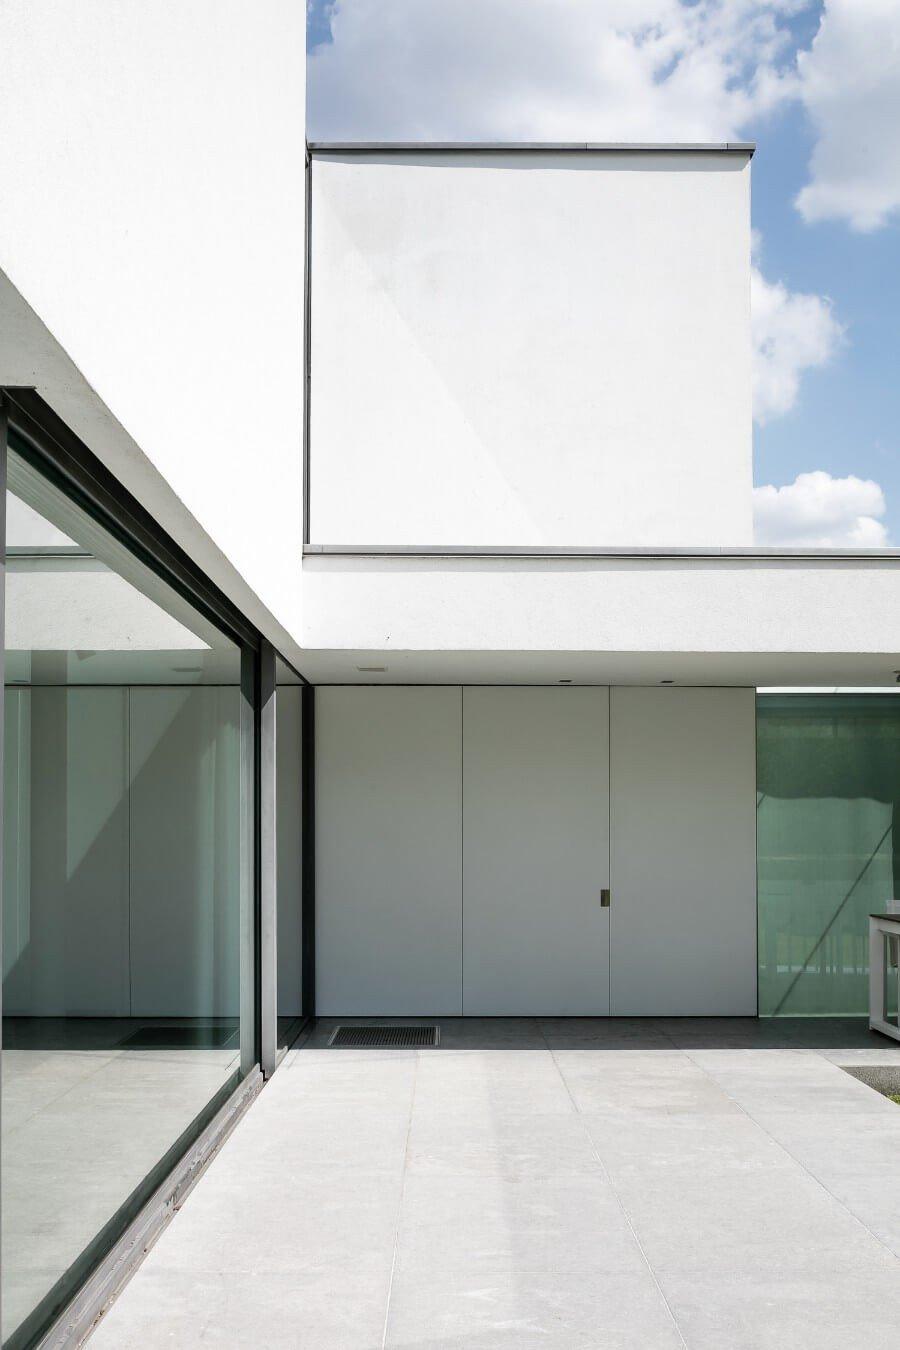 House-MP-Rietveldprojects-Photobycafeine-27